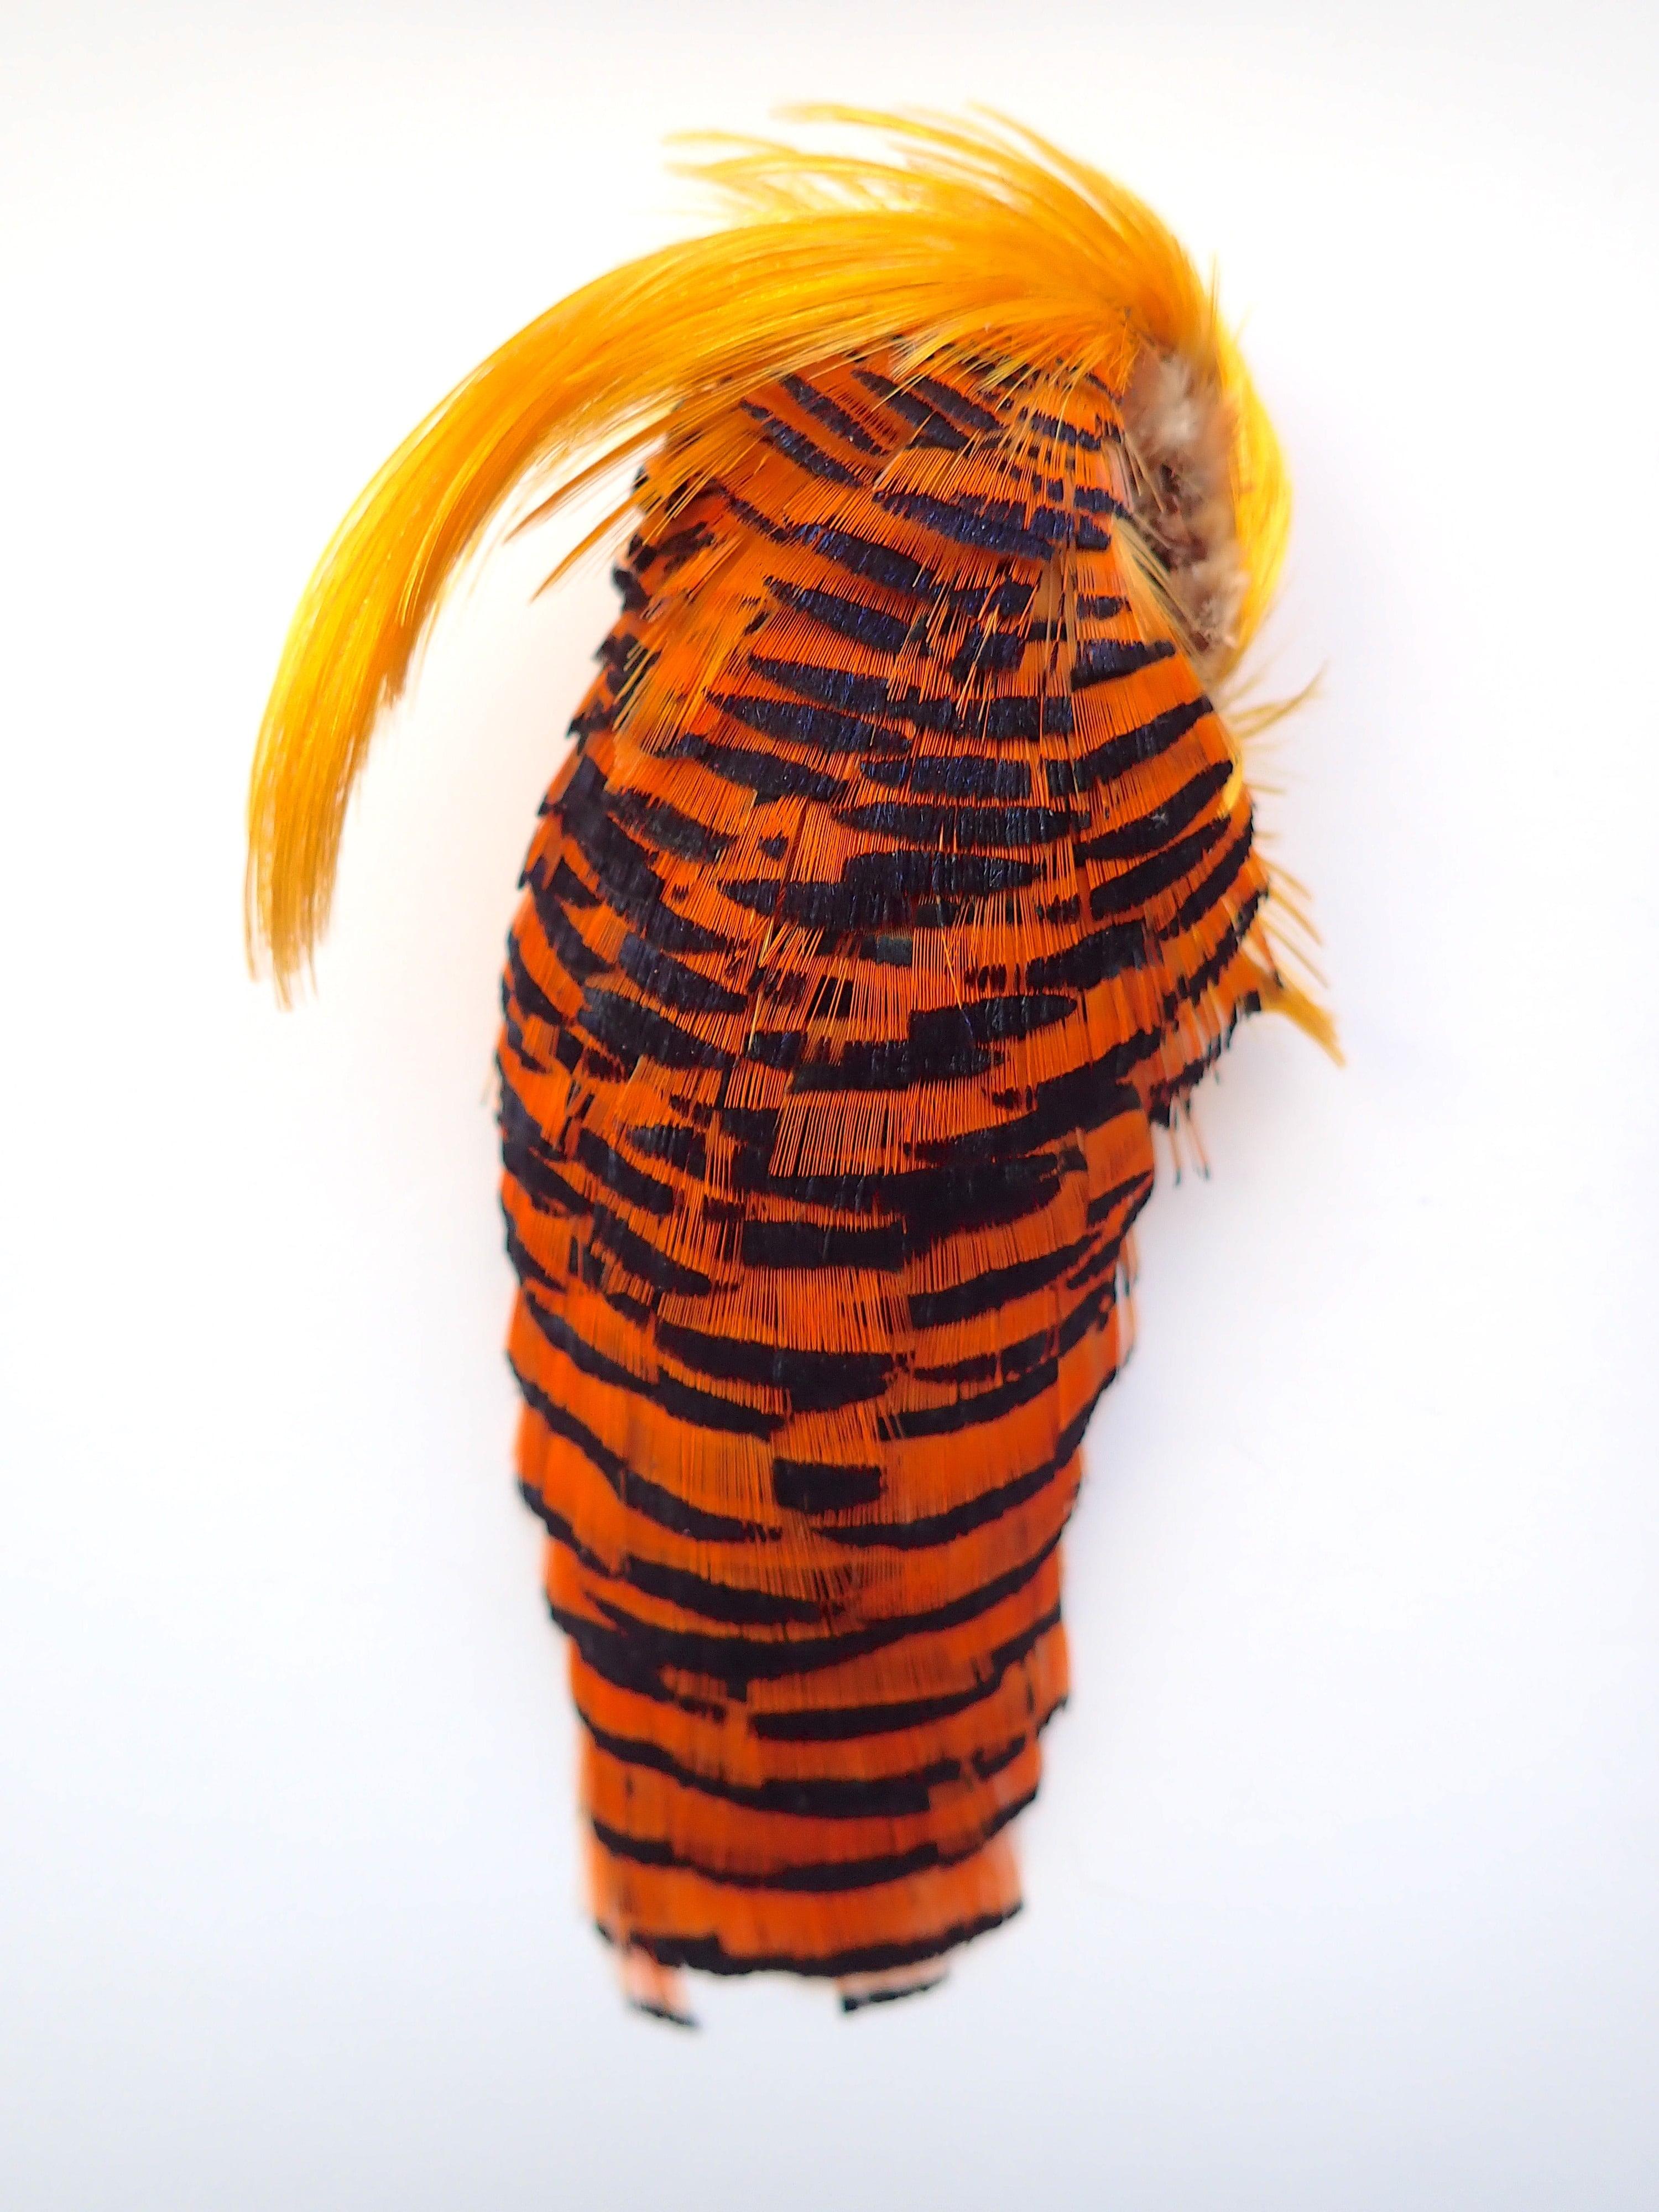 Golden Pheasant Neck Comp. / ゴールデンフェザントネックコンプリート